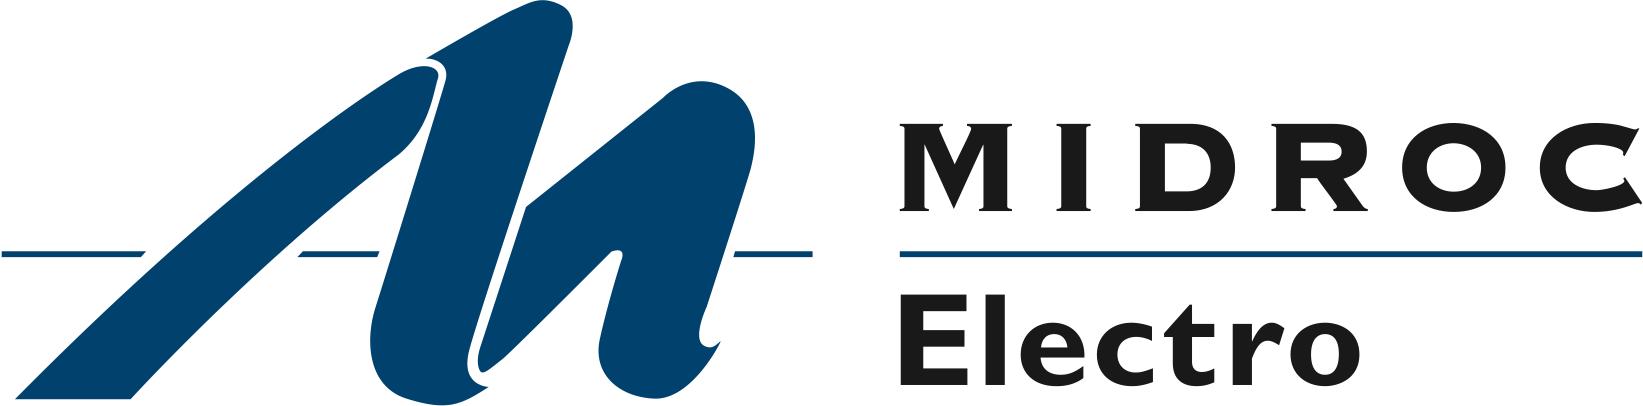 midroclogo2